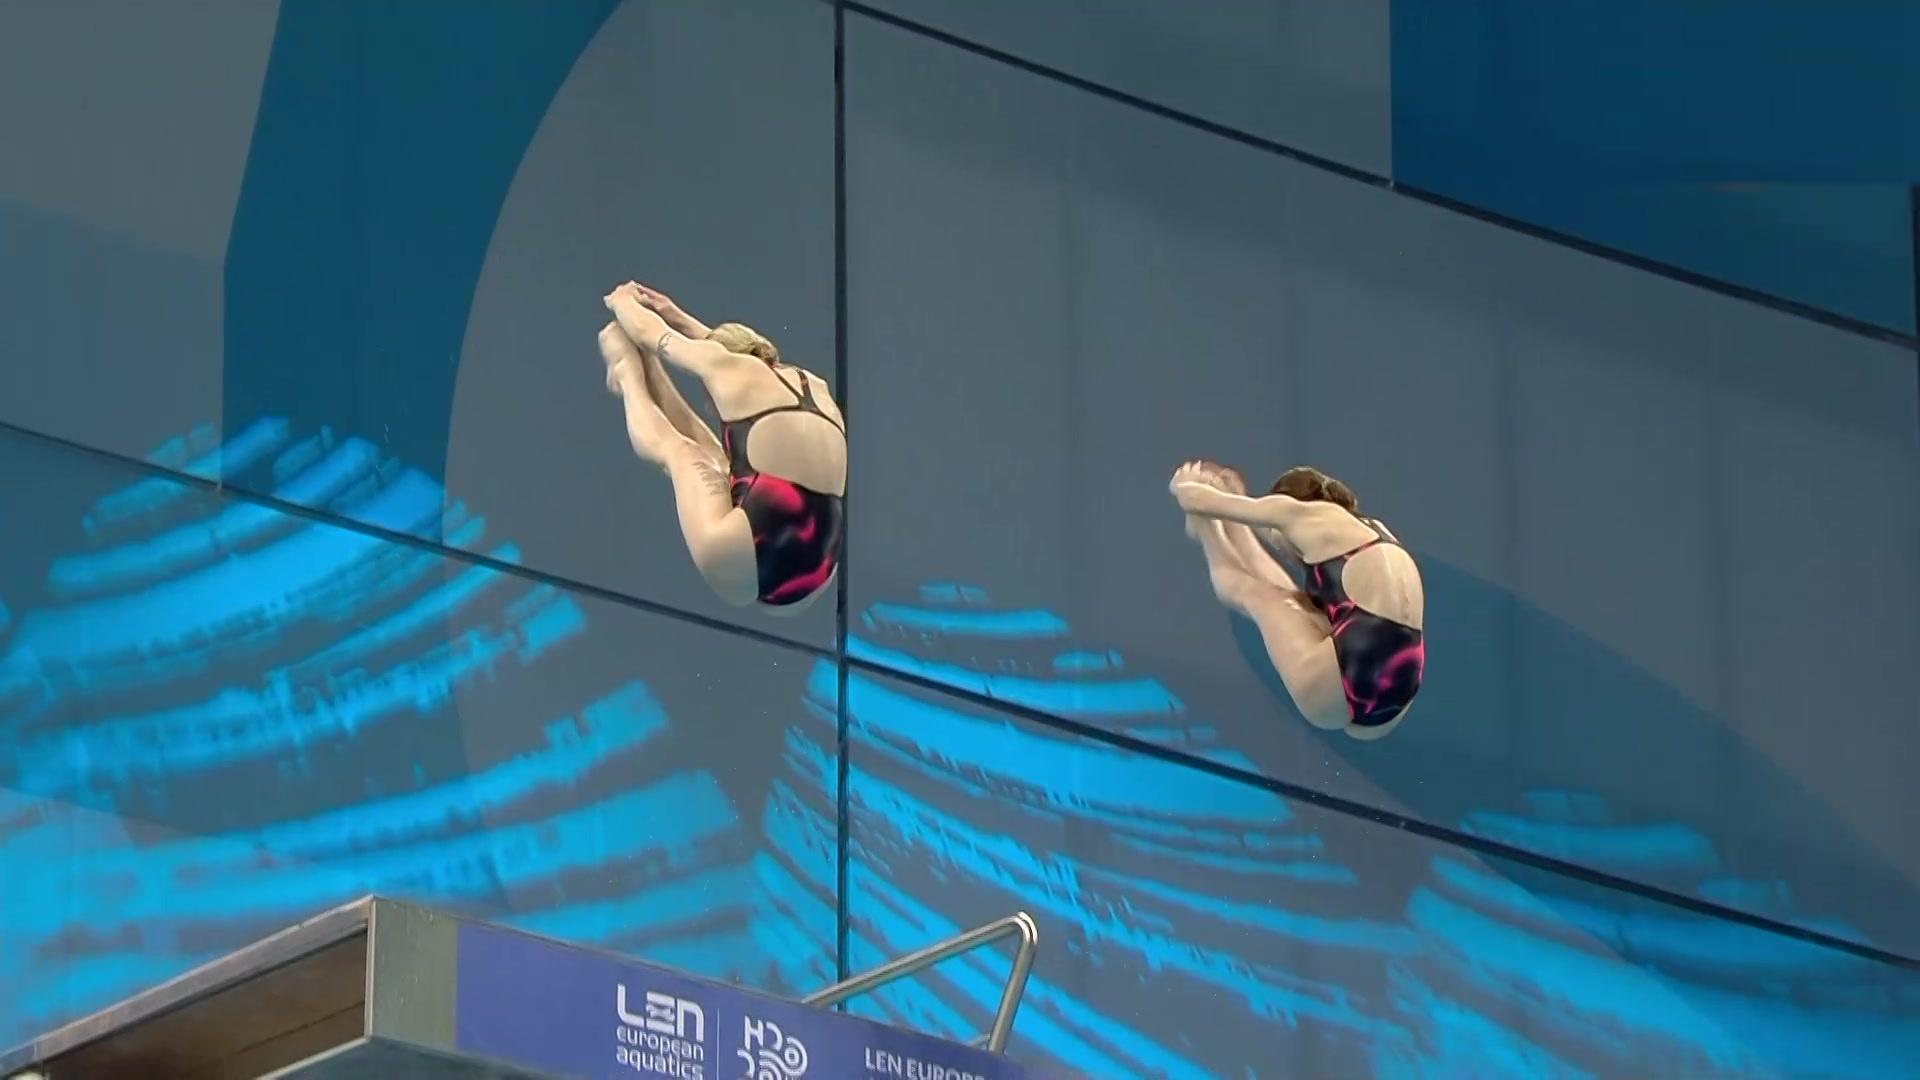 Campeonato de Europa. Saltos: Final 10 m sincroniz. femenino